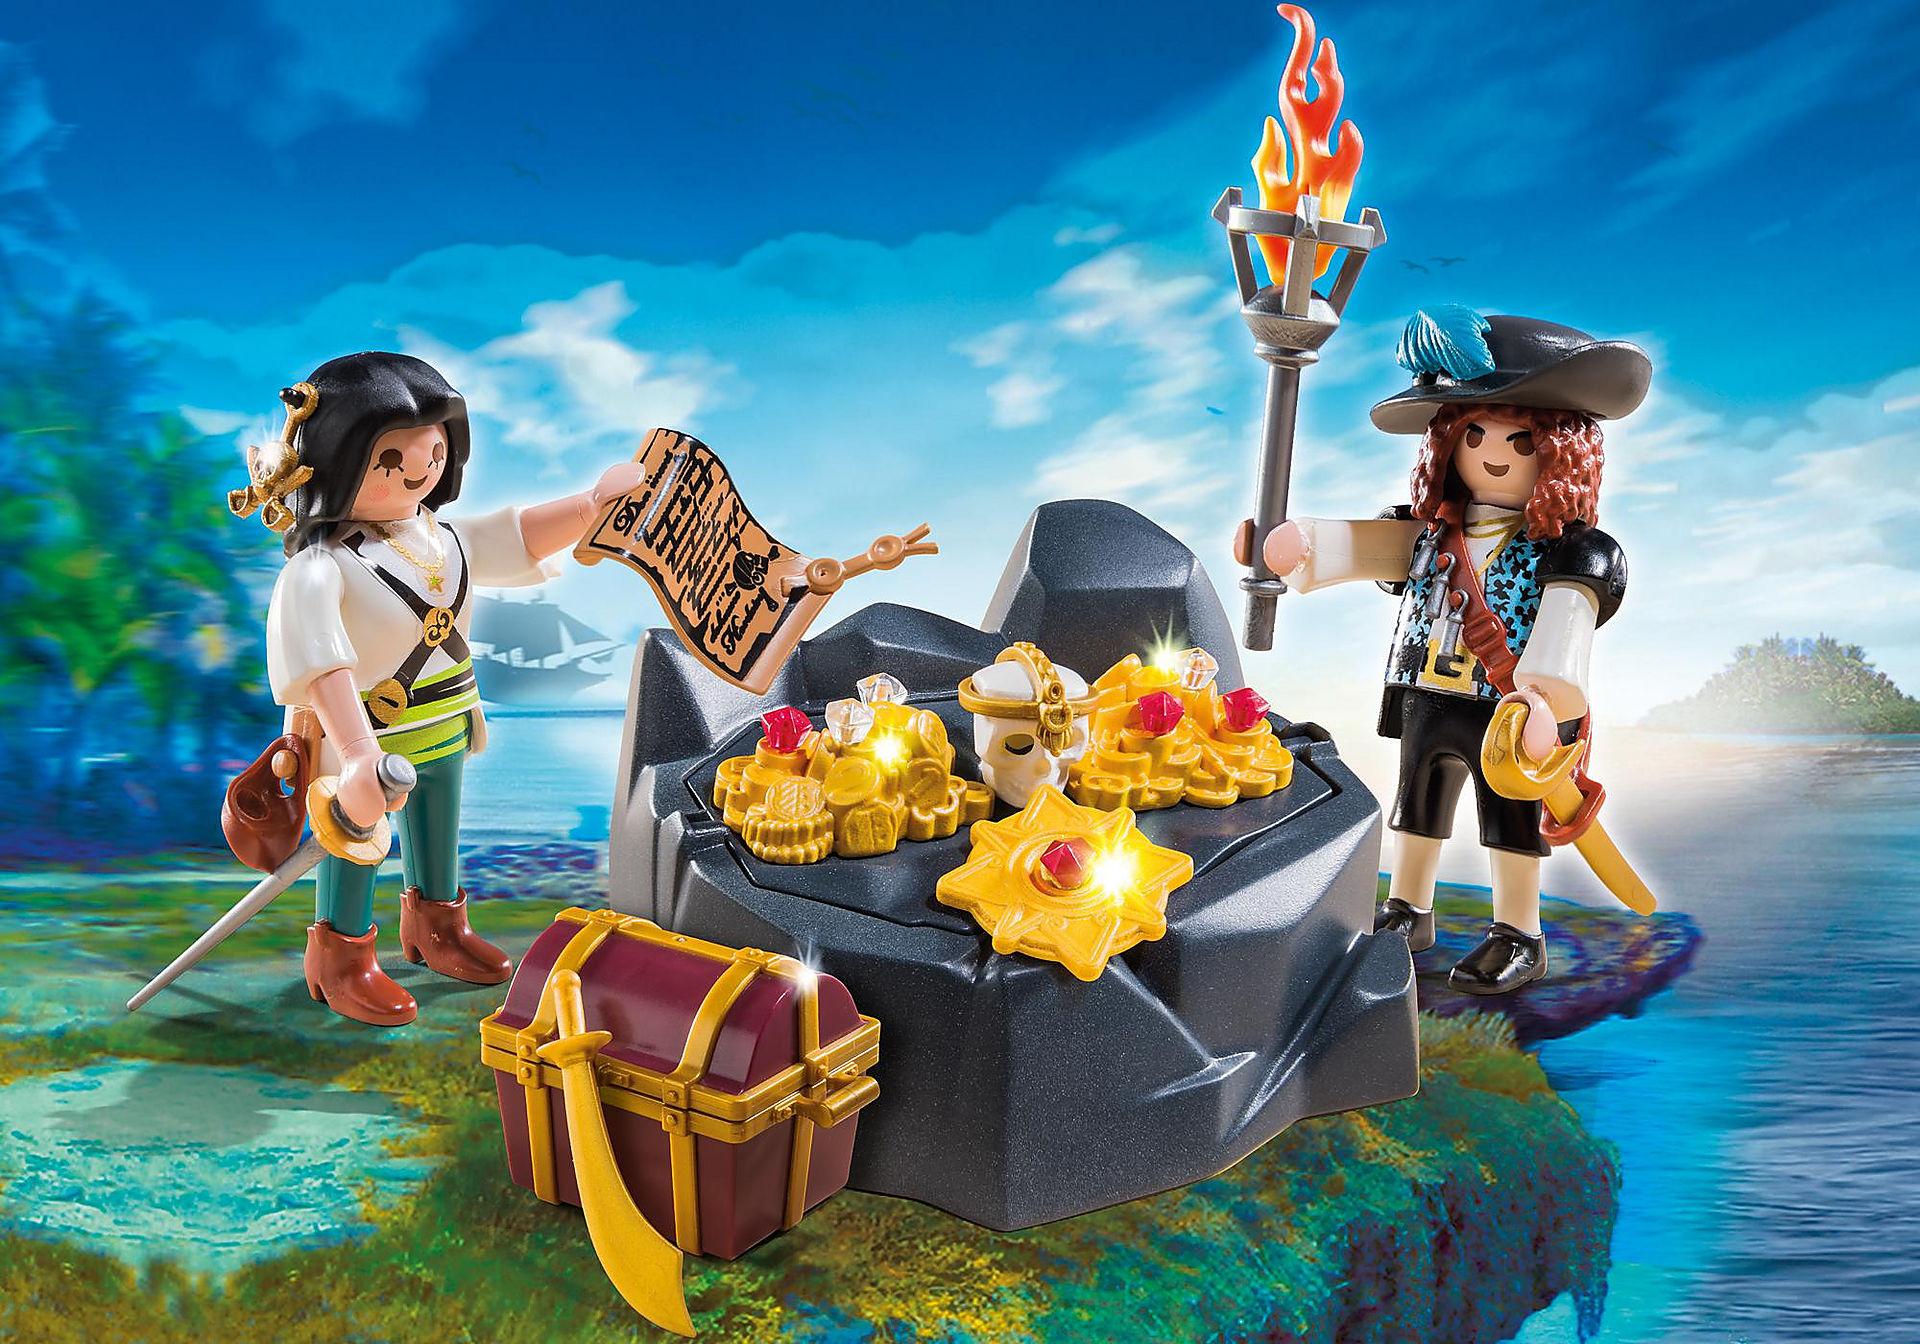 http://media.playmobil.com/i/playmobil/6683_product_detail/Pirate Treasure Hideout